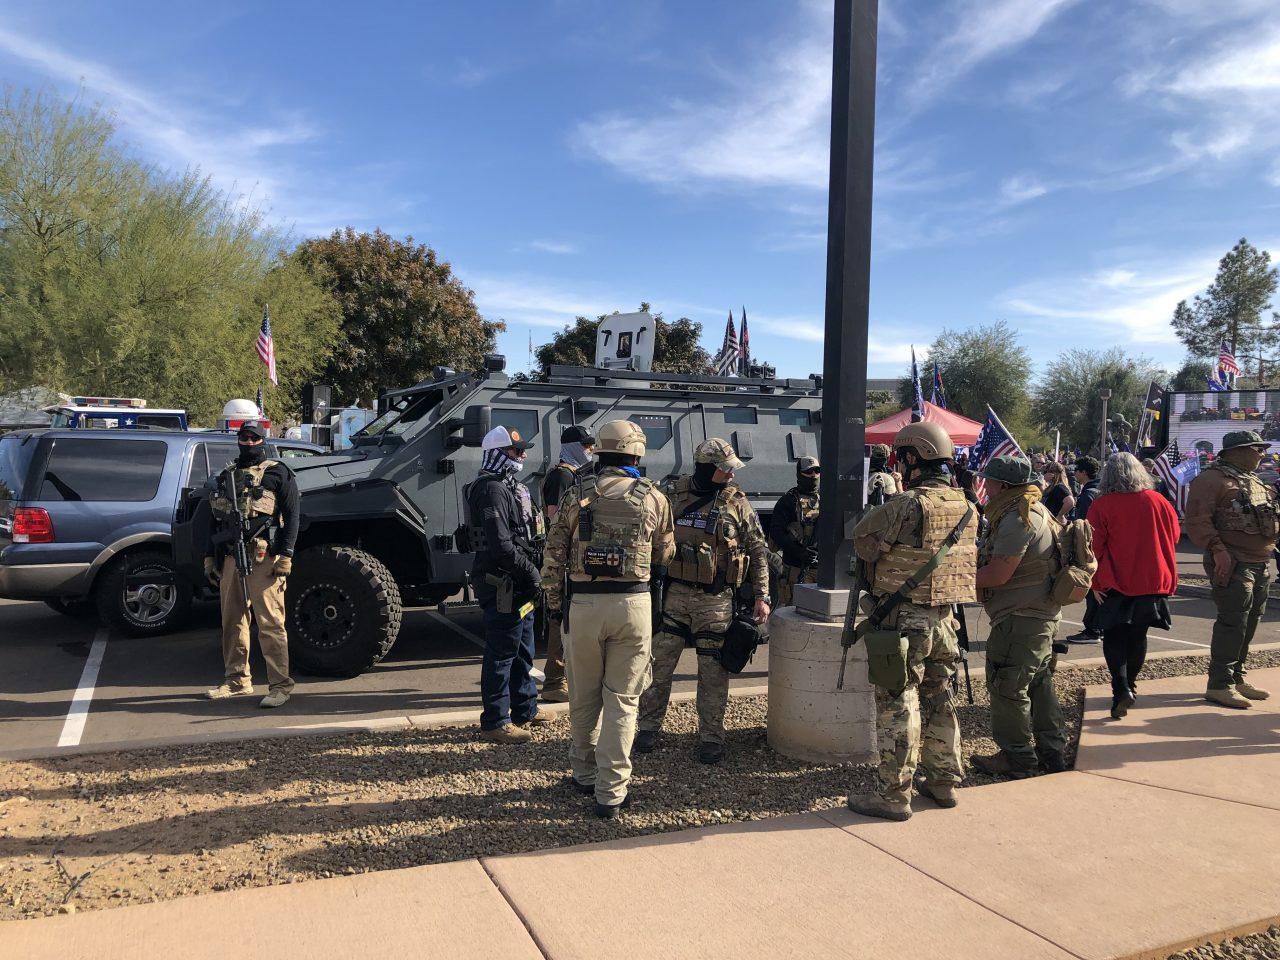 https://www.phoenixmag.com/wp-content/uploads/2021/01/Militia-gathered-by-Pit-Bull-VX-van-1280x960.jpg